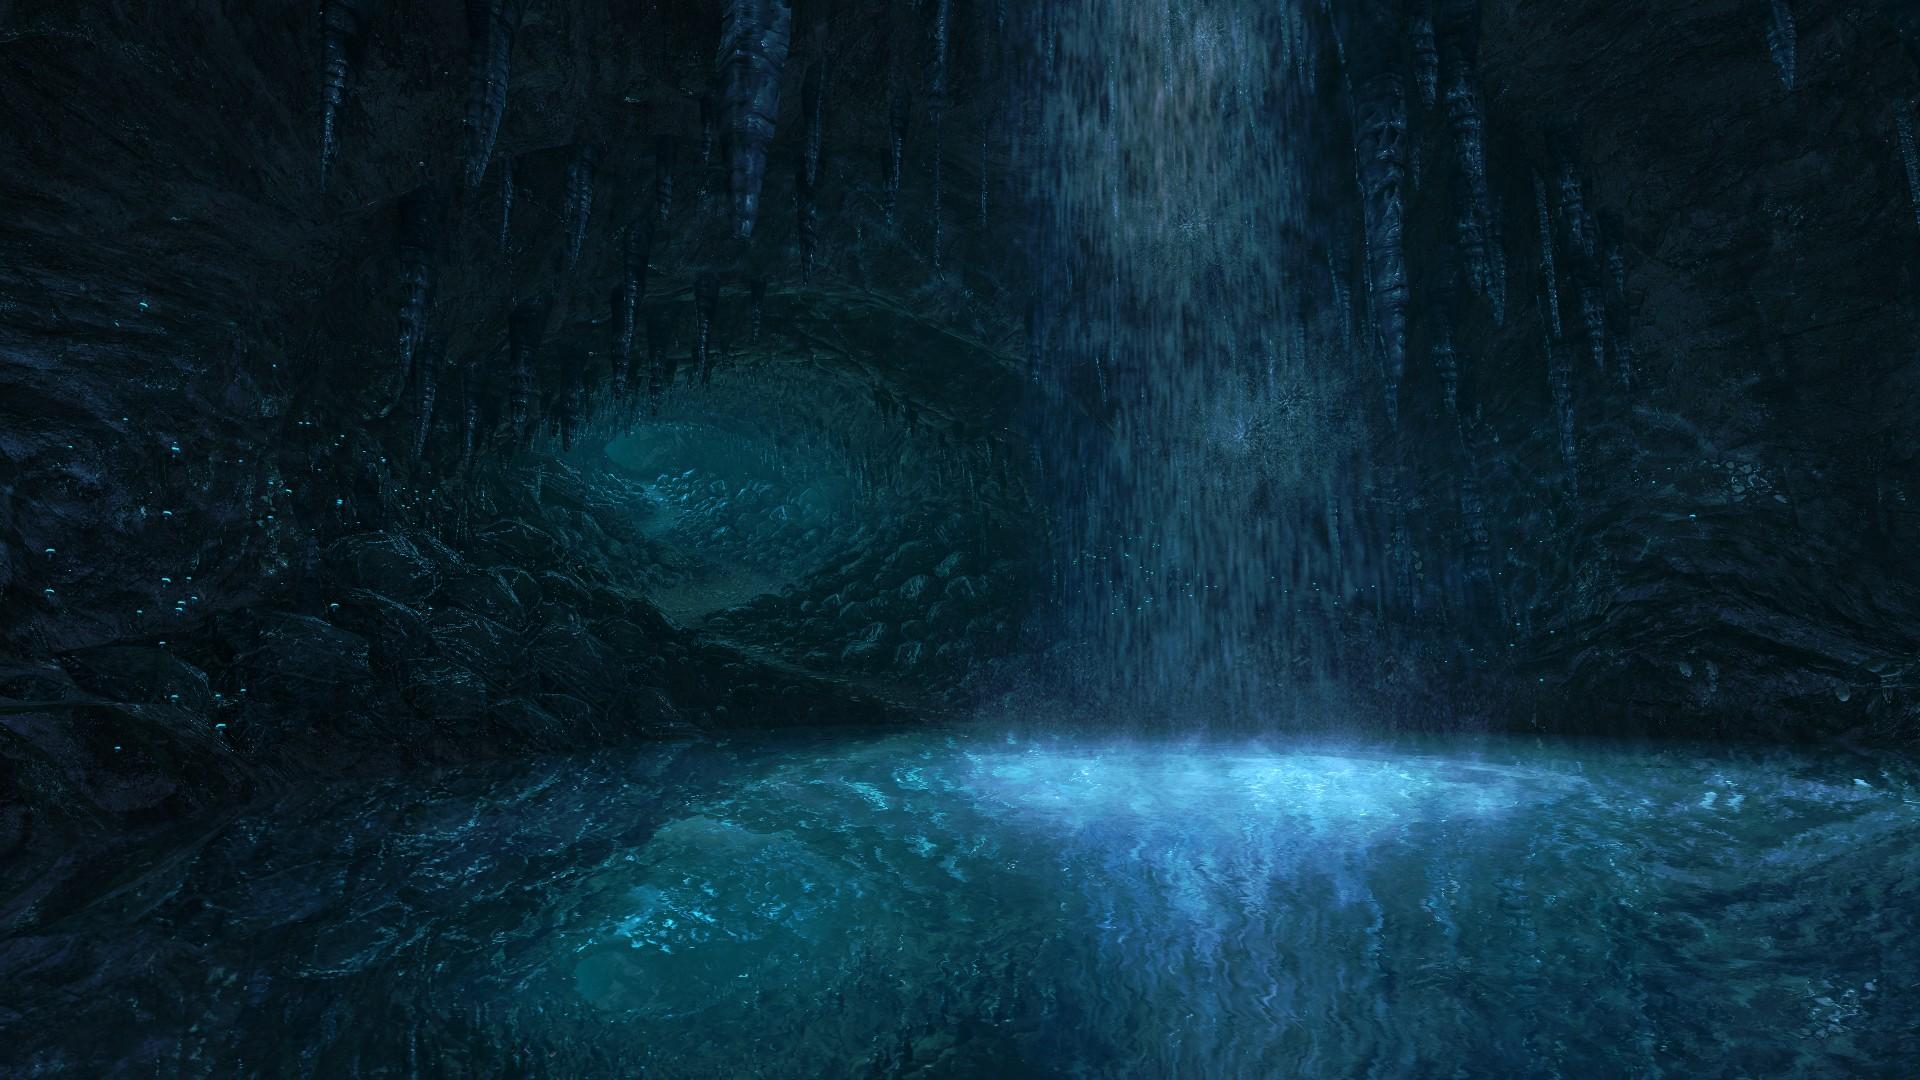 http://i3.imageban.ru/out/2012/02/10/bfbfa631a7511436daa87de2c0248151.jpg